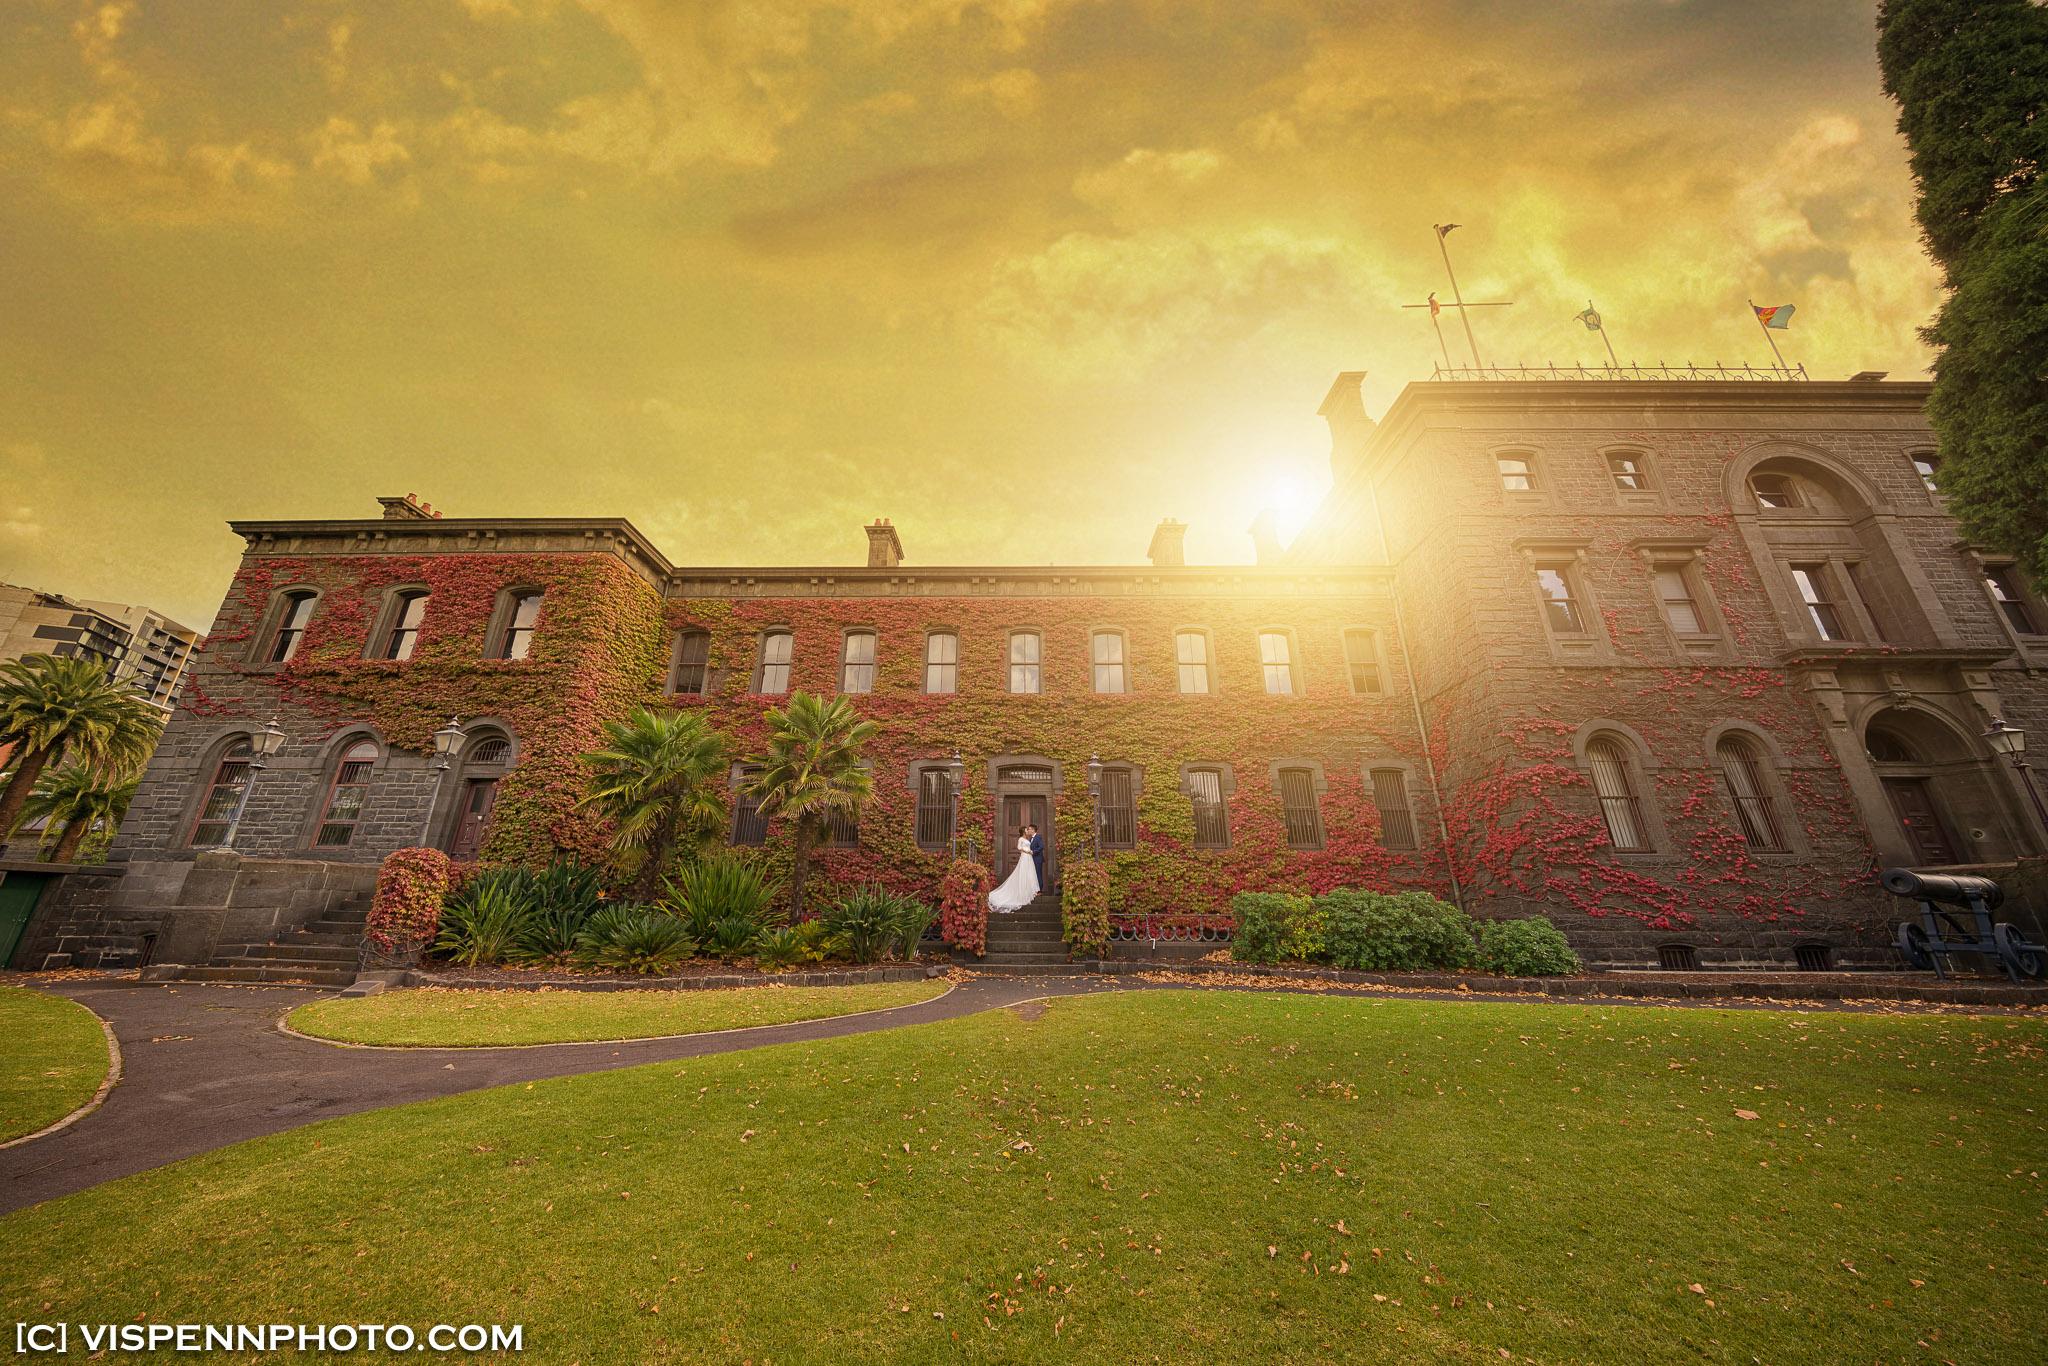 PRE WEDDING Photography Melbourne VISPENN 墨尔本 婚纱照 结婚照 婚纱摄影 VISPENN AthenaXiao 0043 copy